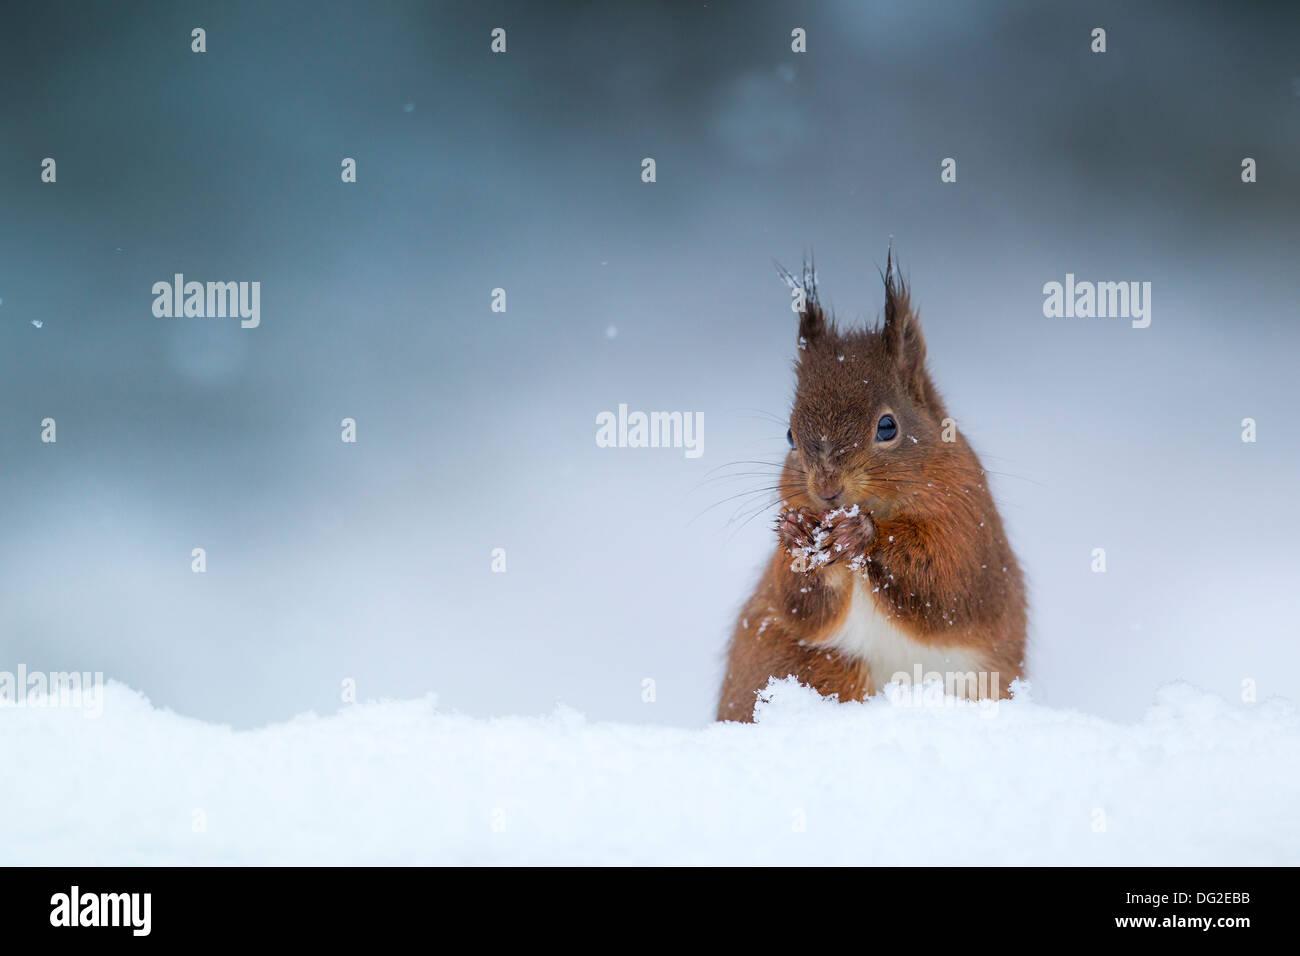 Red Squirrel (Sciurus vulgaris) sat posing in falling snow in woodland setting. Yorkshire Dales, North Yorkshire, UK - Stock Image